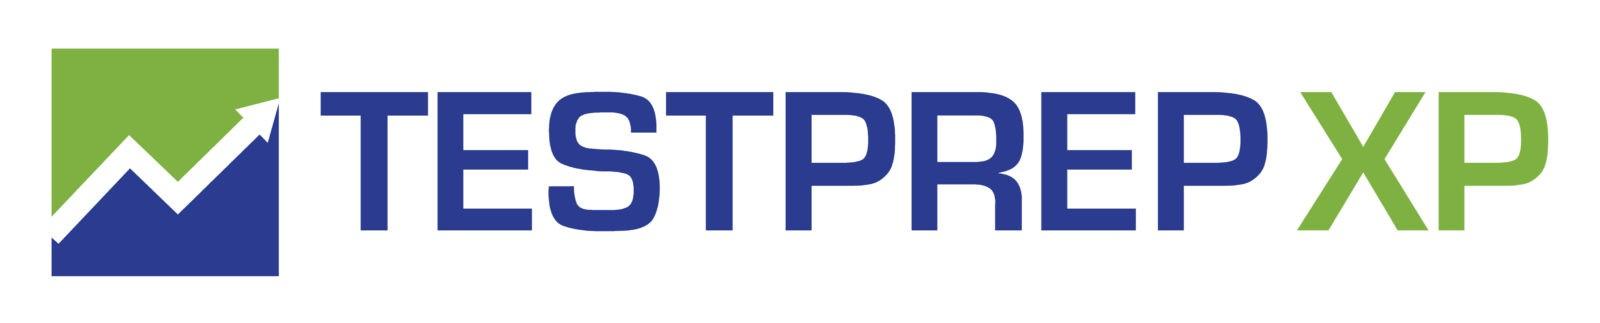 Test Prep XP